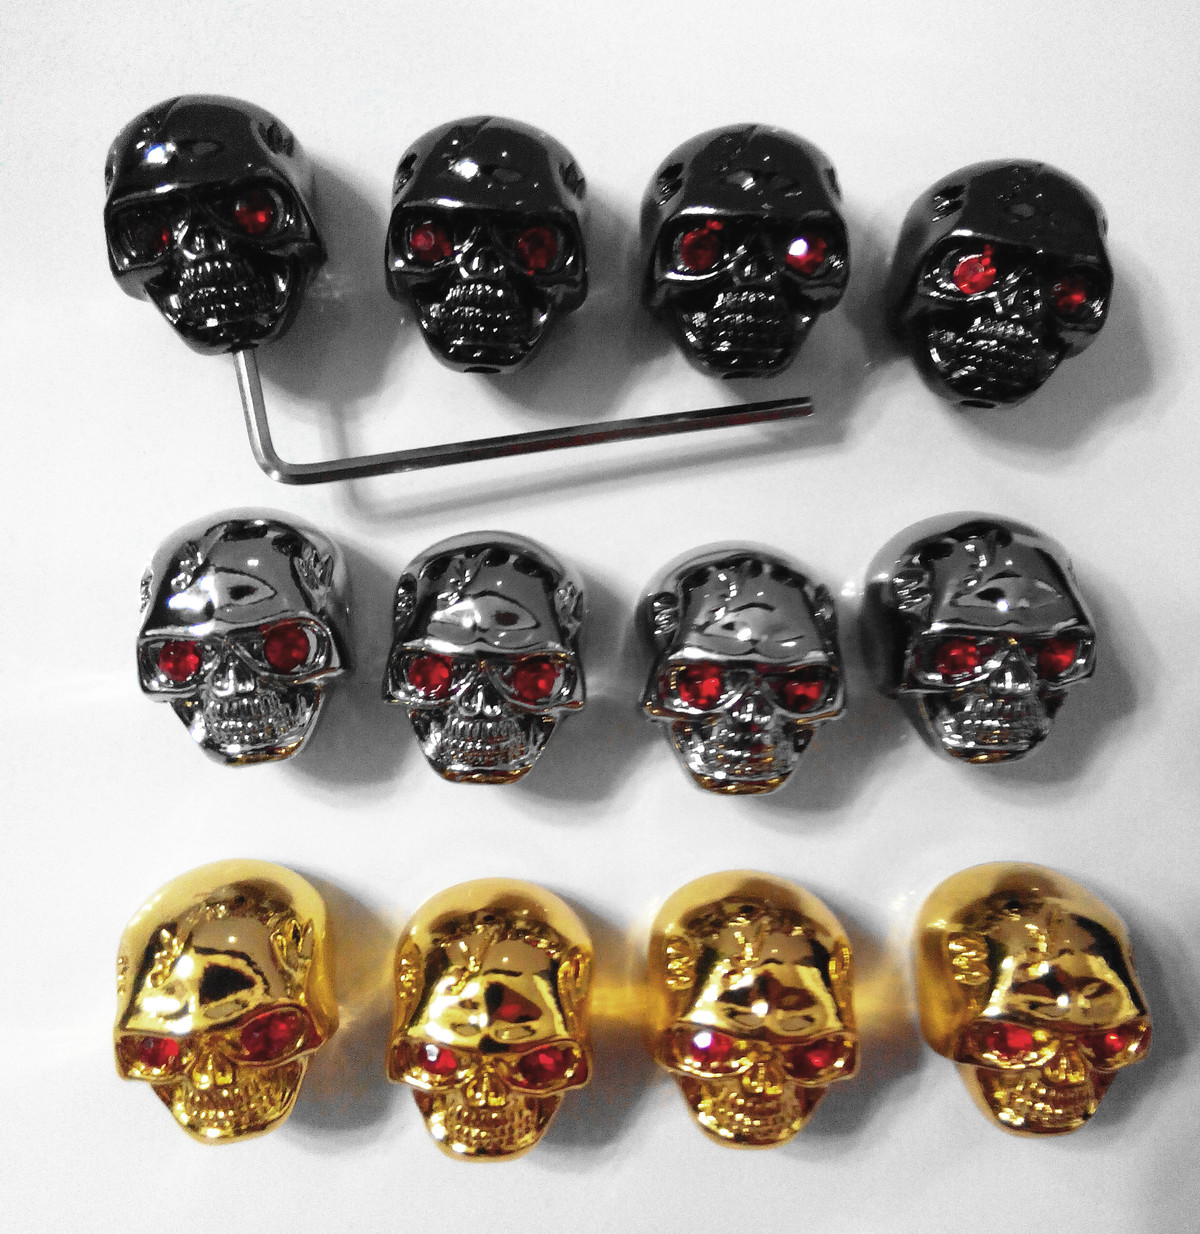 BQLZR Black Electric Guitar Skull Volume Tone Knobs Skull Head Skull Knob Pack of 3